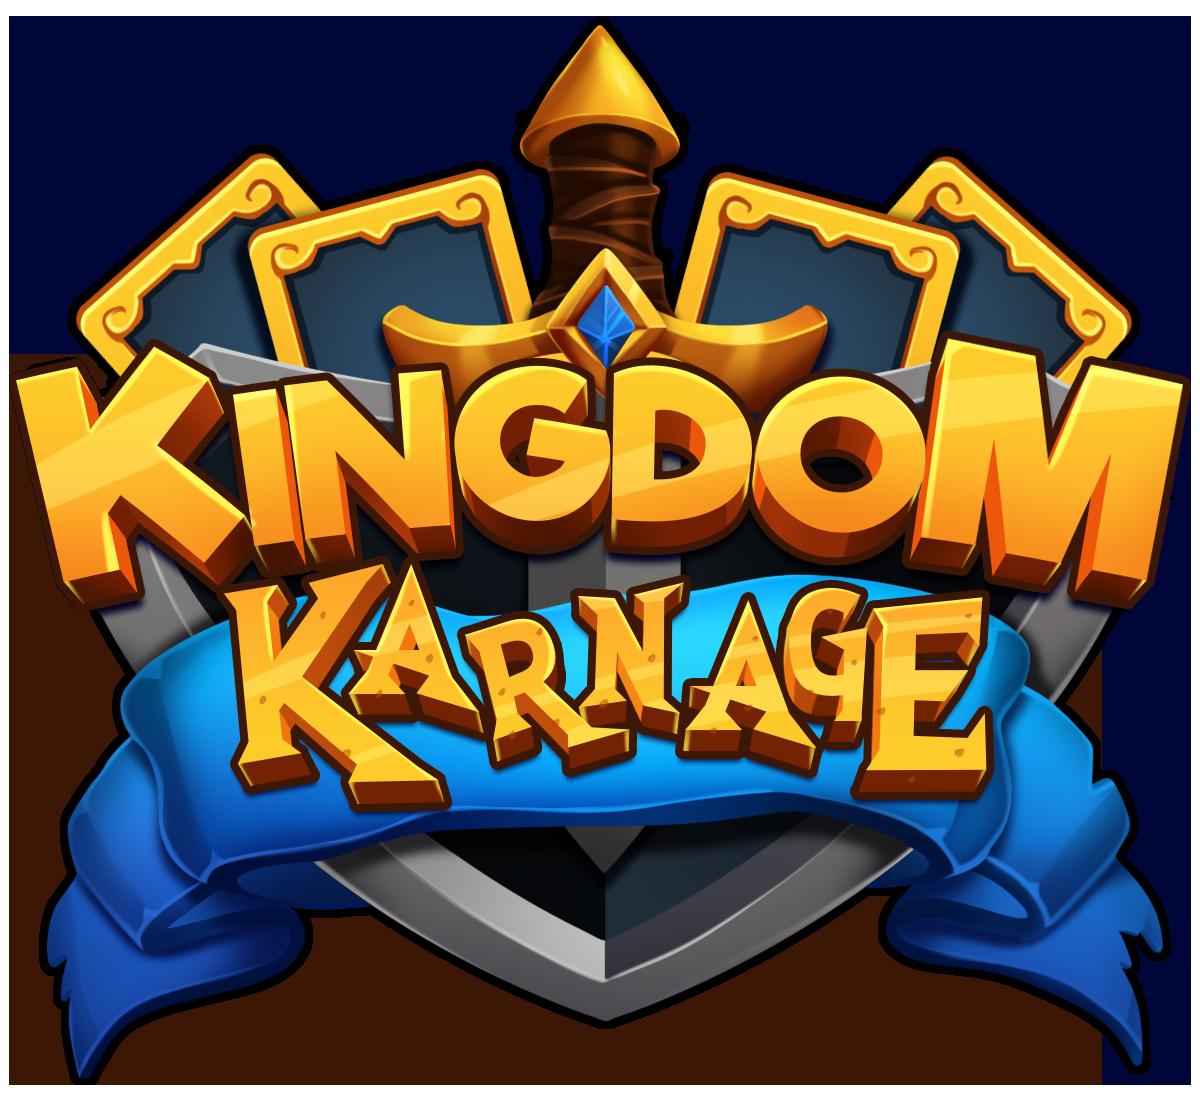 Kingdom karnage.png